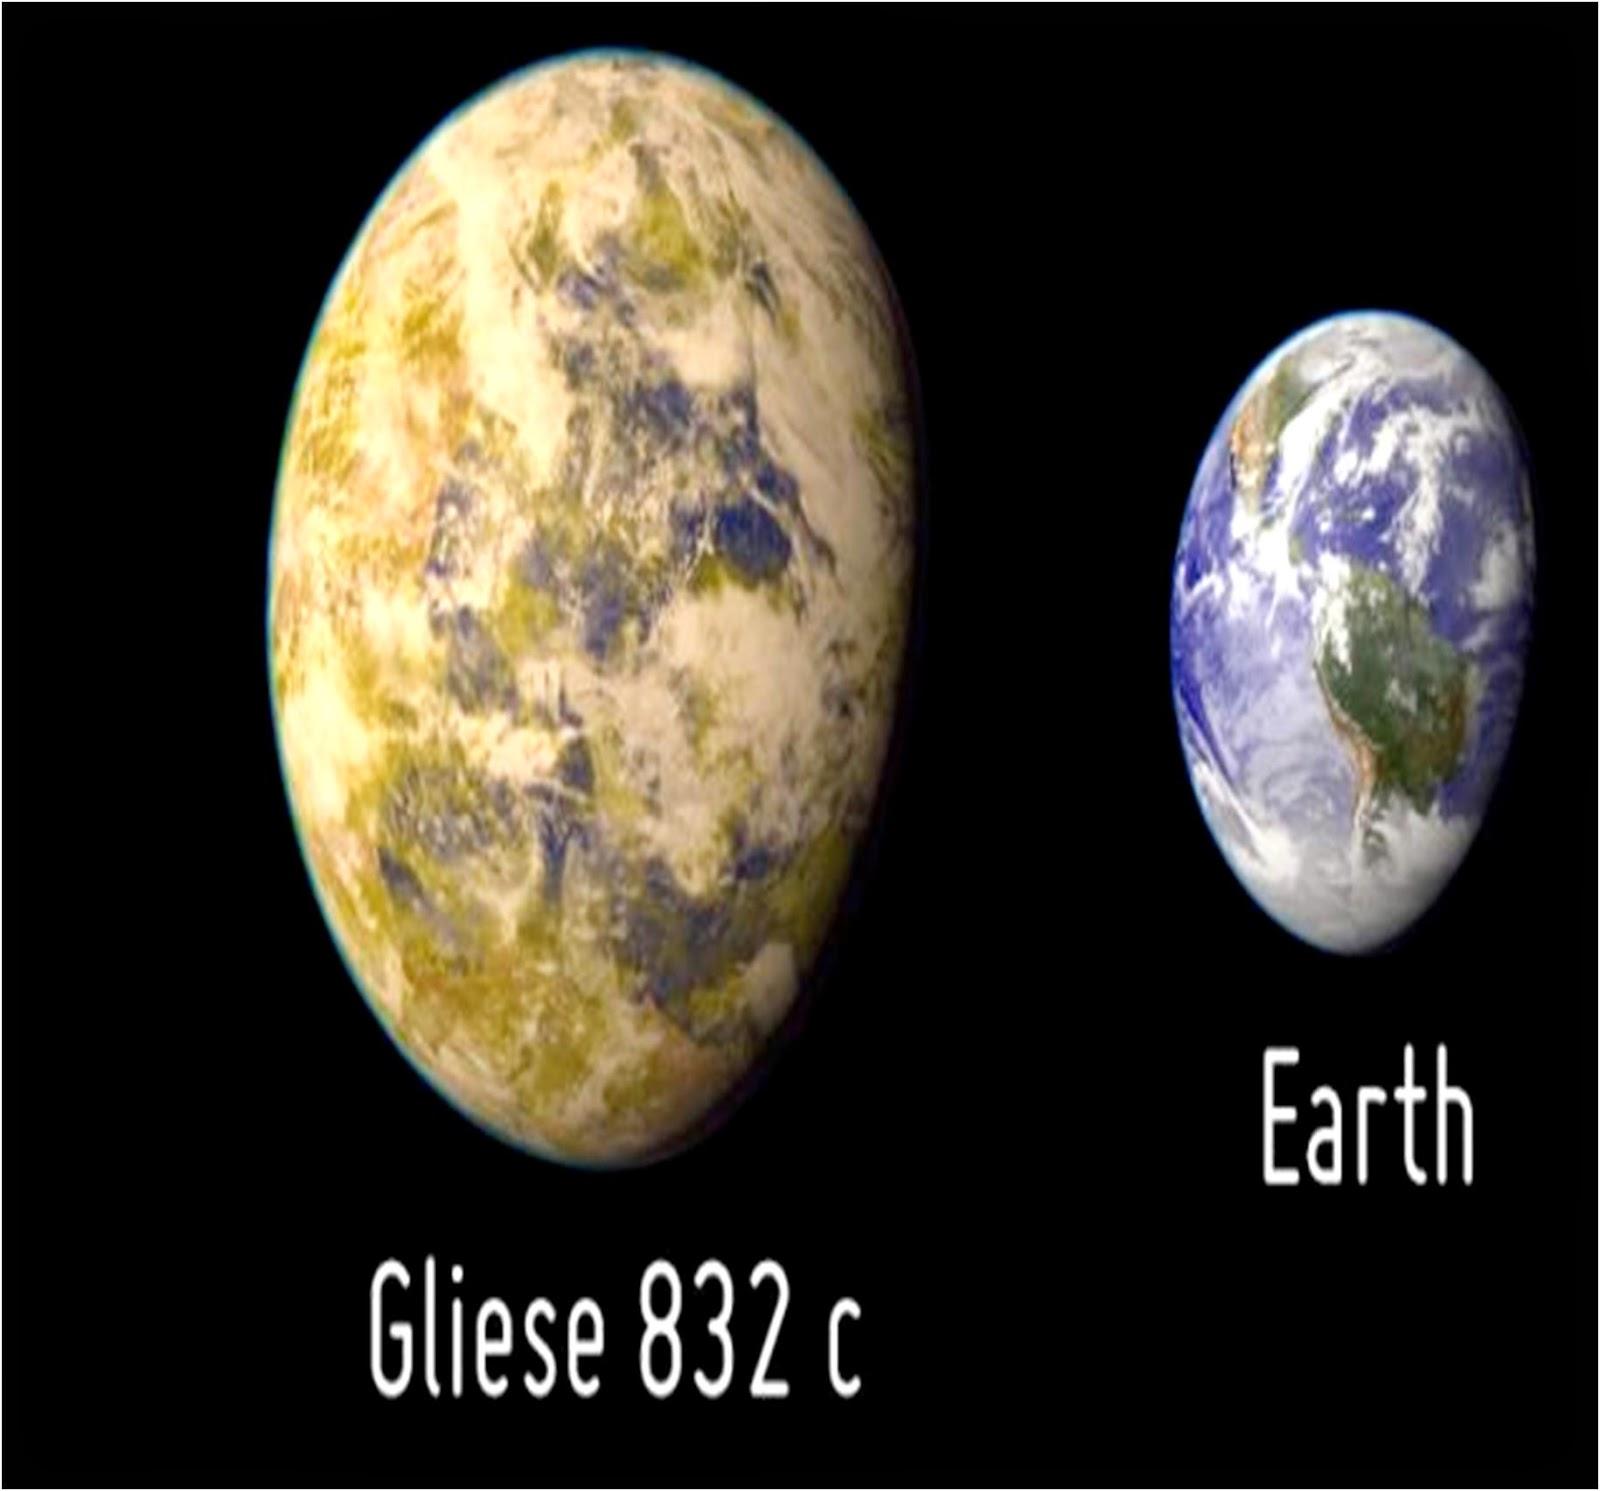 gliese 832 moons - photo #3